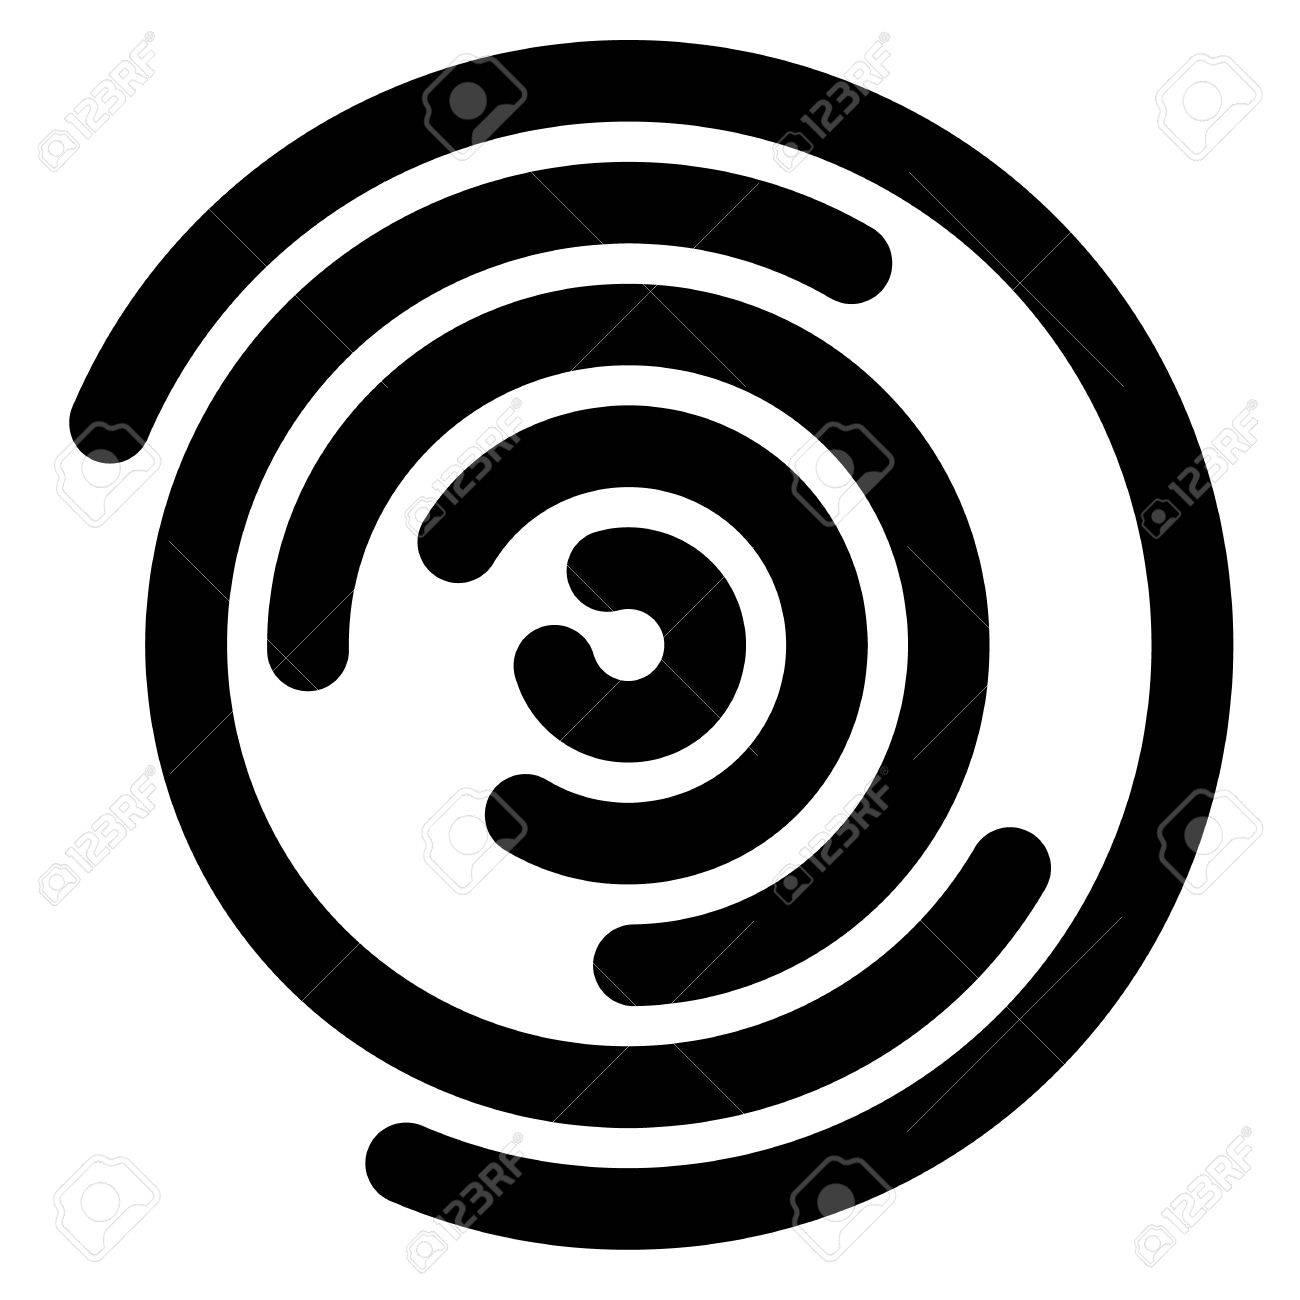 1300x1300 Concentric Segments Of Circles, Random Lines Following A Circle